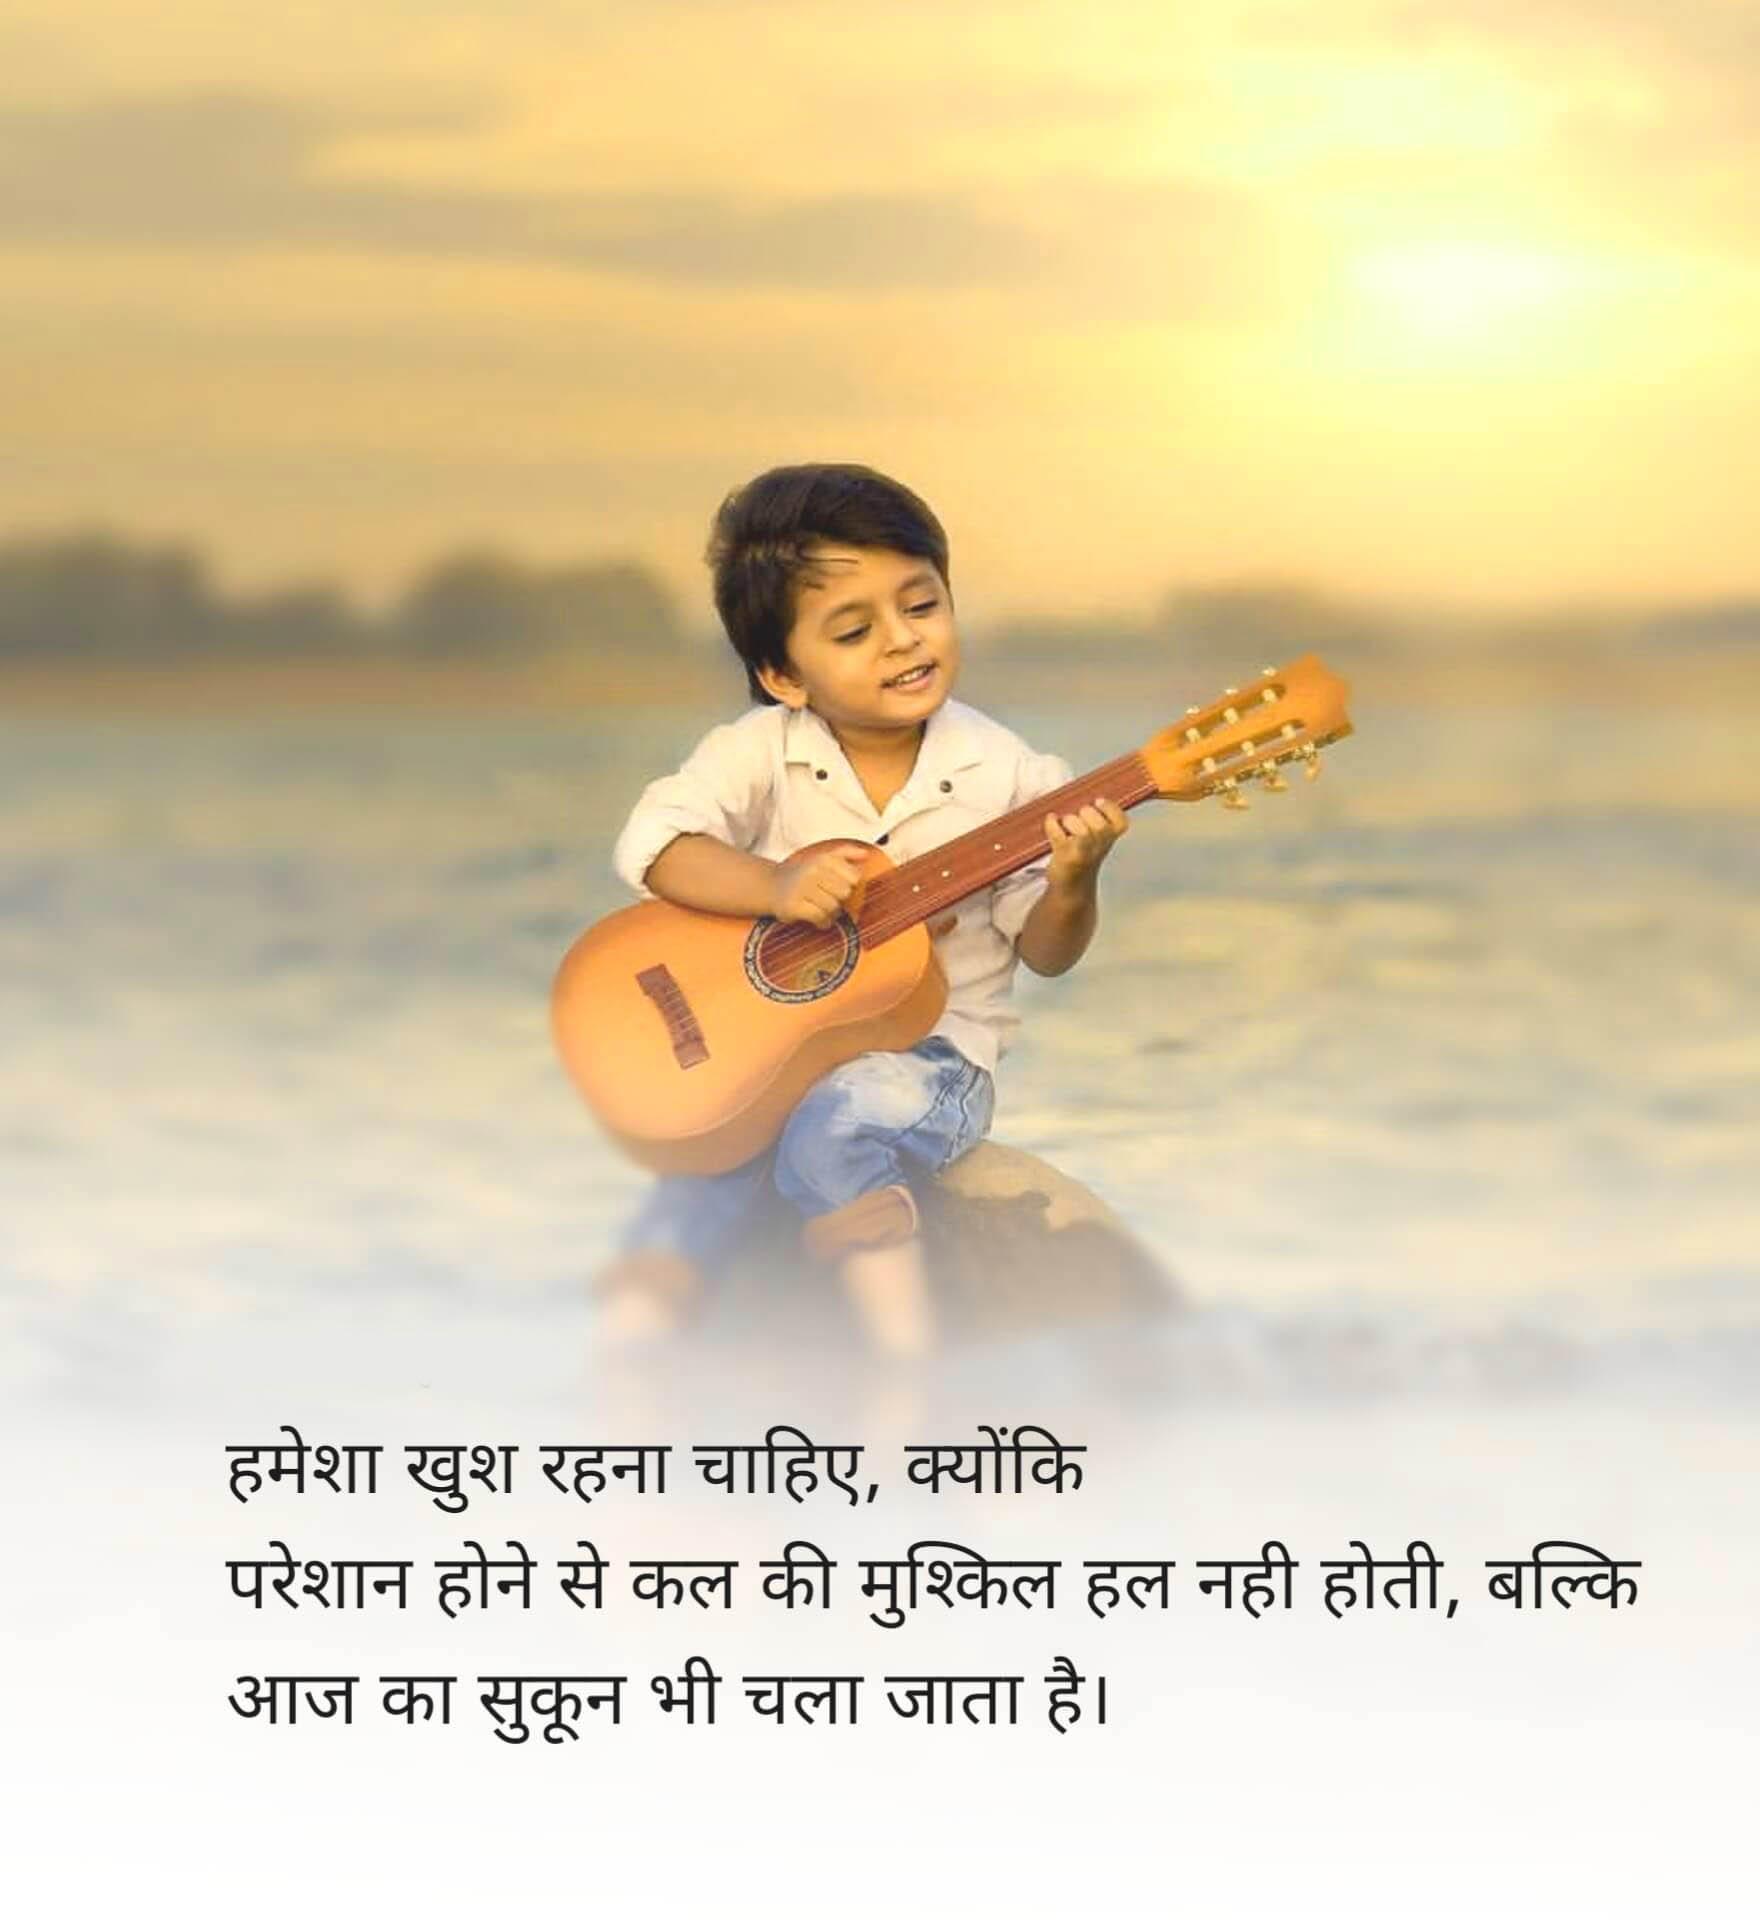 Whatsapp DP Pics Images With Hindi Quotes 1